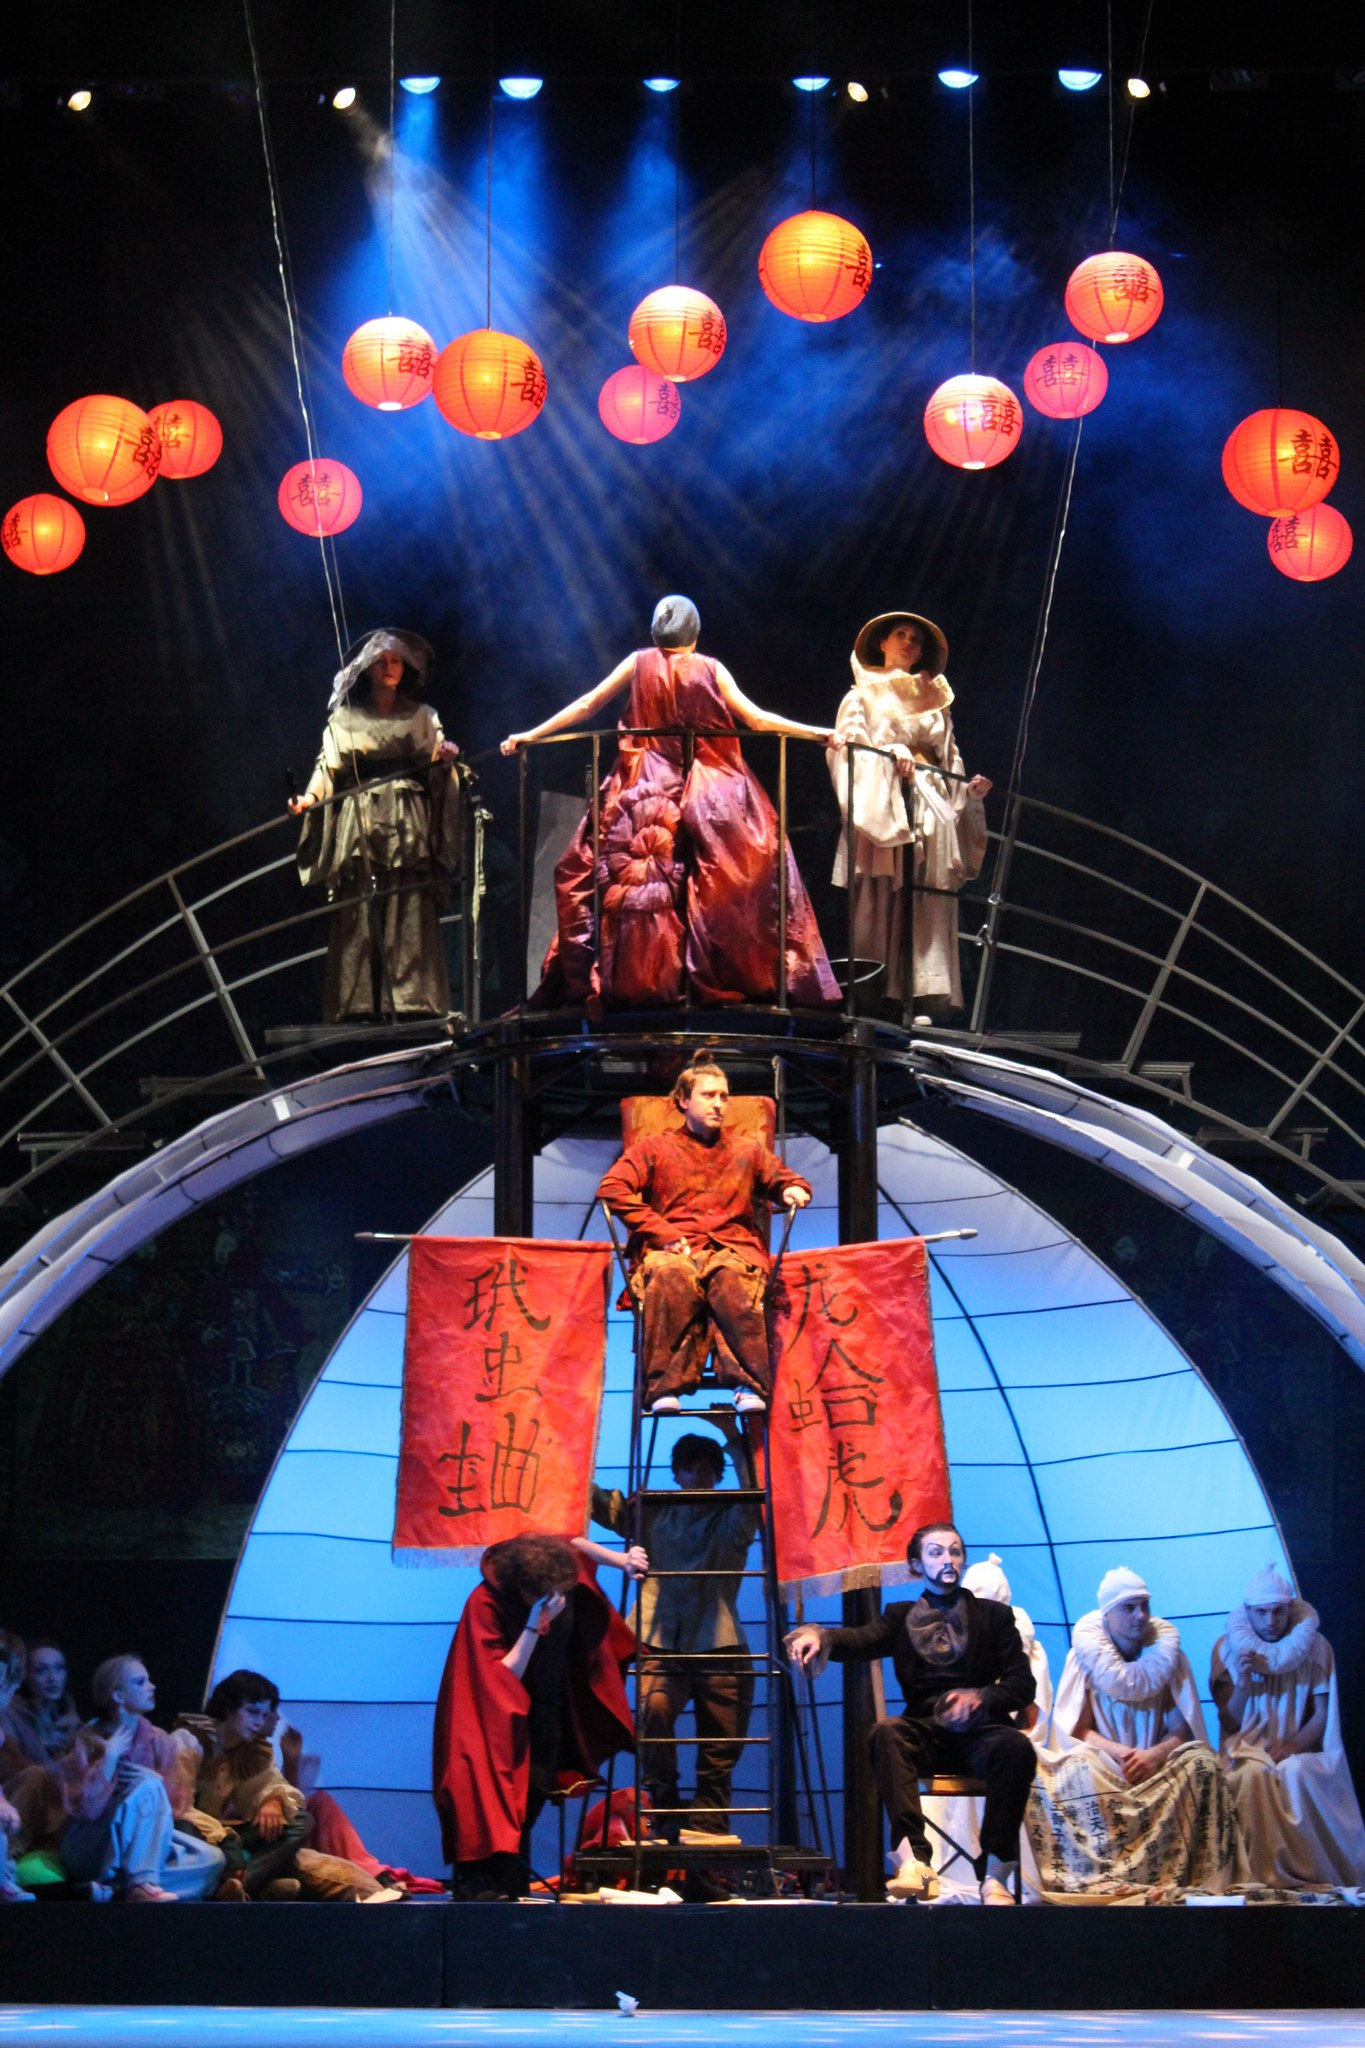 Онлайн-спектакль «Принцесса Турандот» по пьесе Карло Гоцци